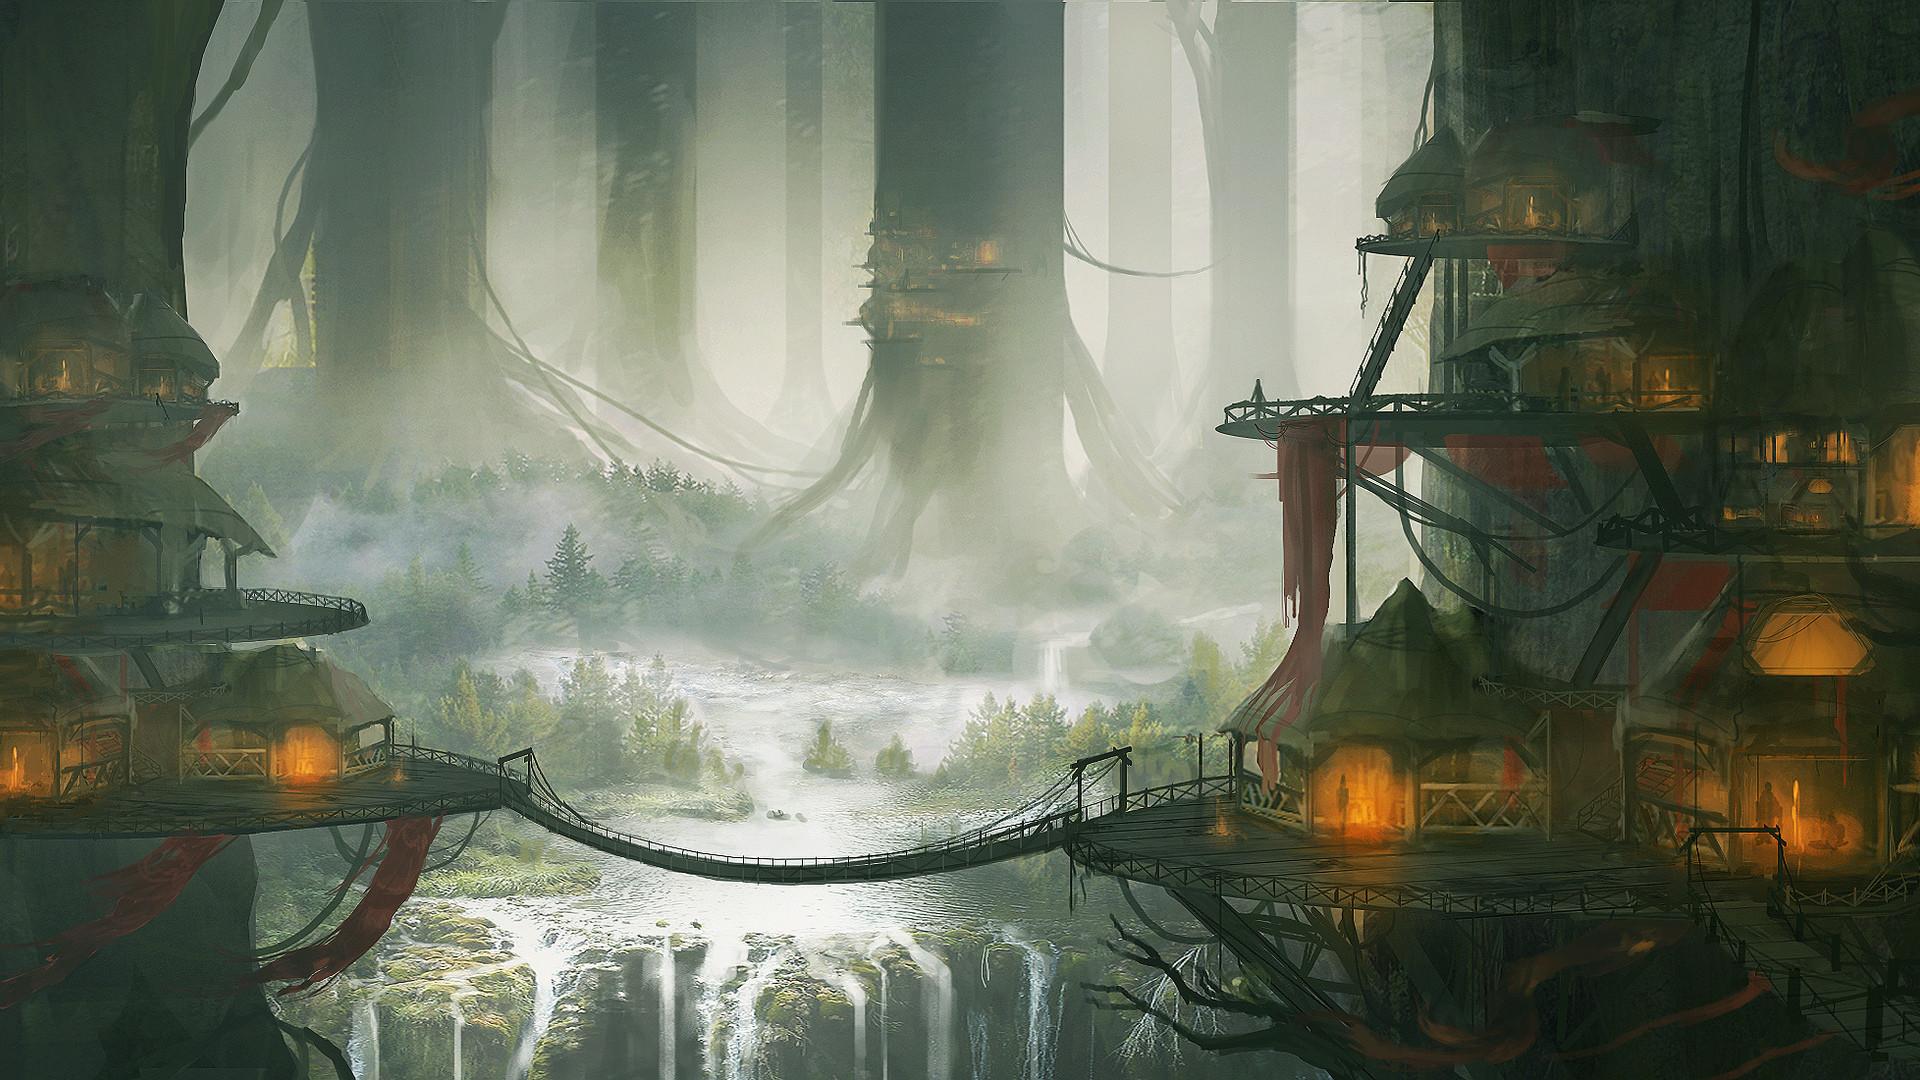 Fantasy Forest Landscape Wallpaper 2014 HD